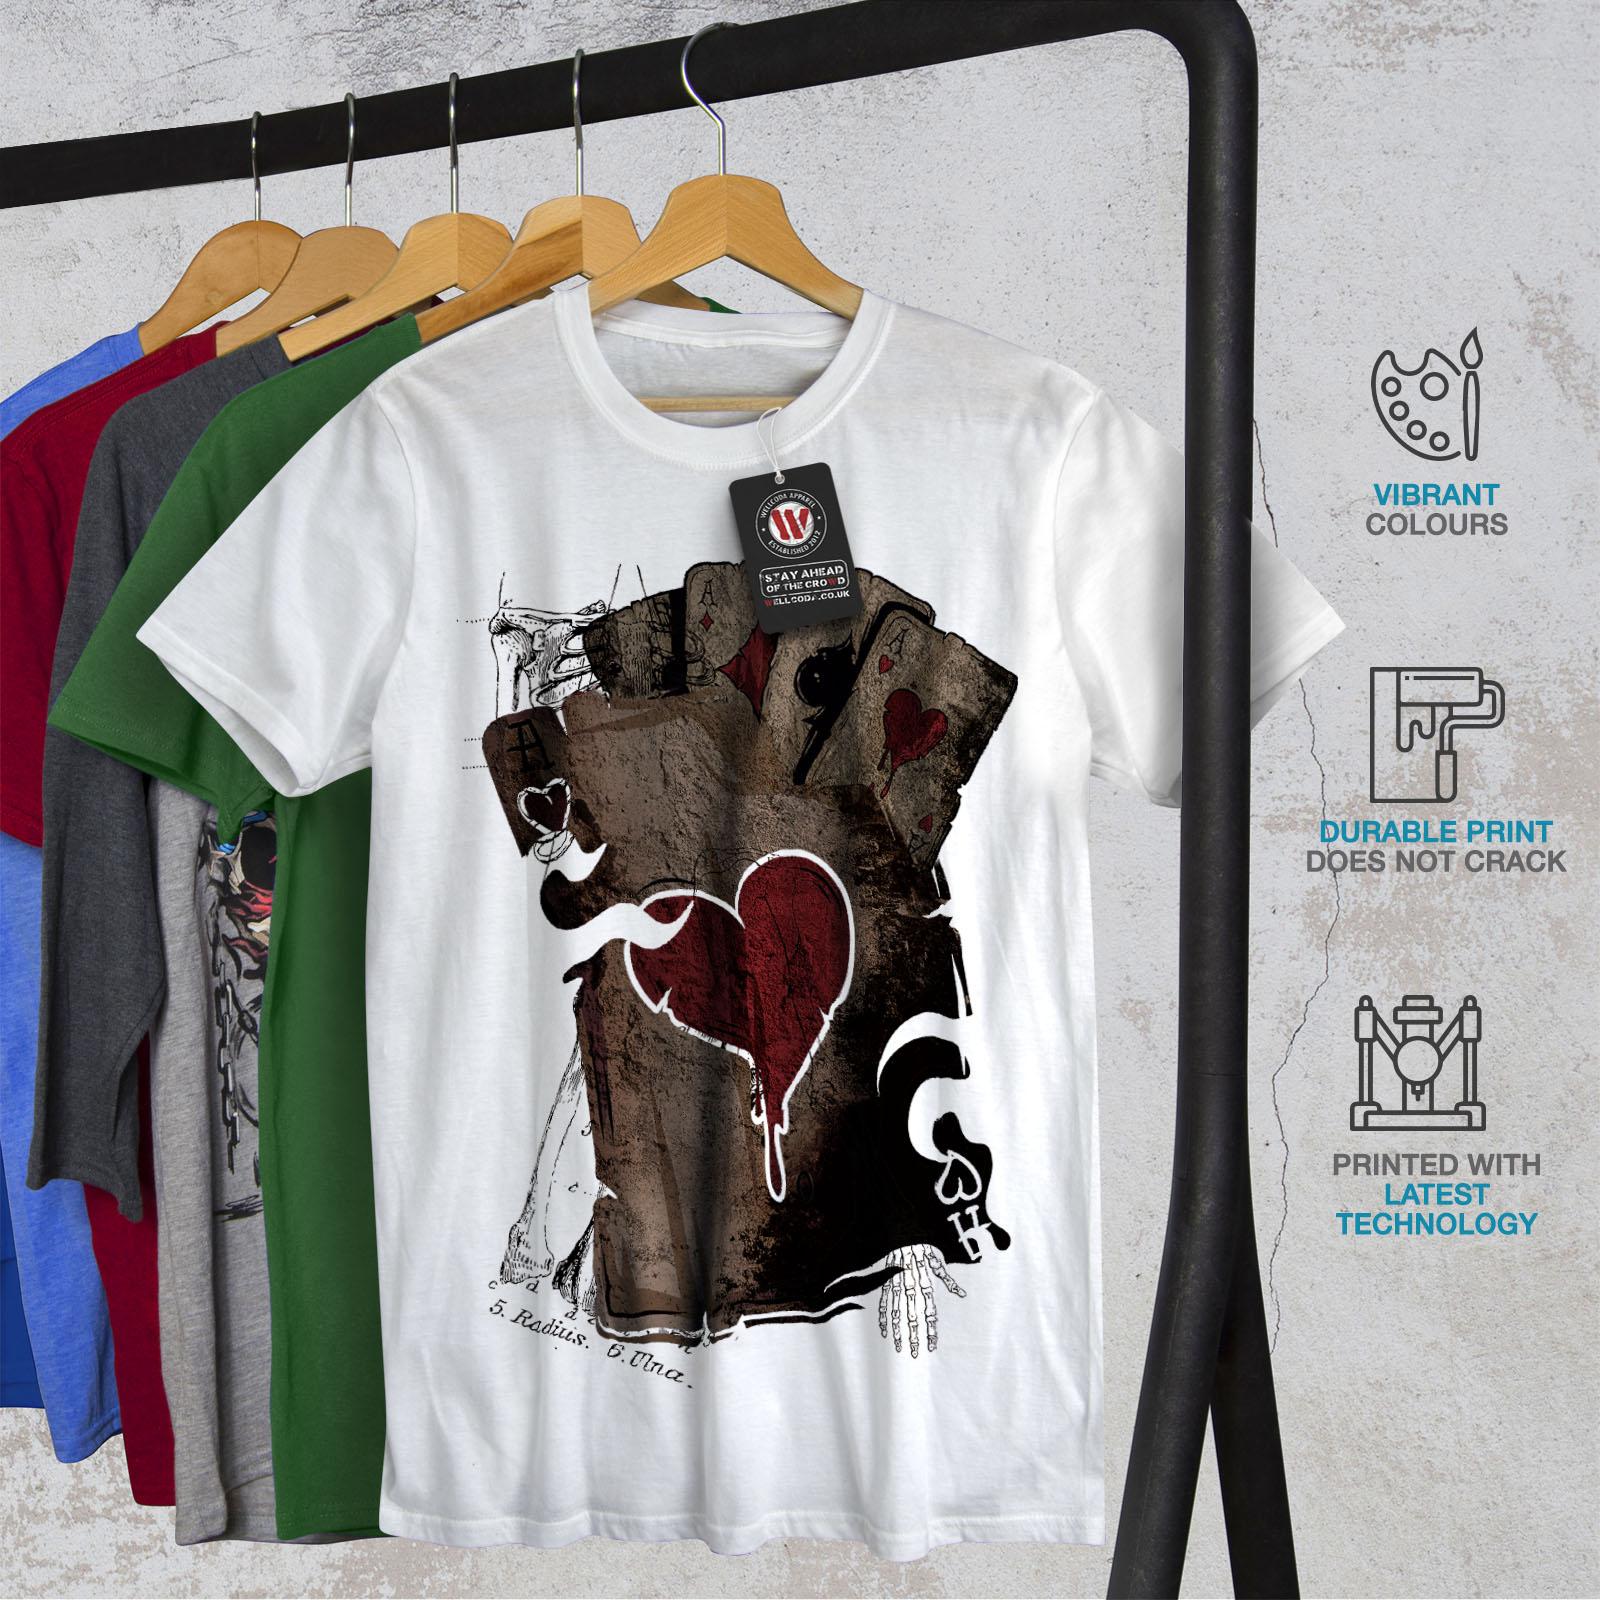 Wellcoda-Poker-Gamble-Squelette-T-shirt-homme-effrayant-conception-graphique-imprime-Tee miniature 12